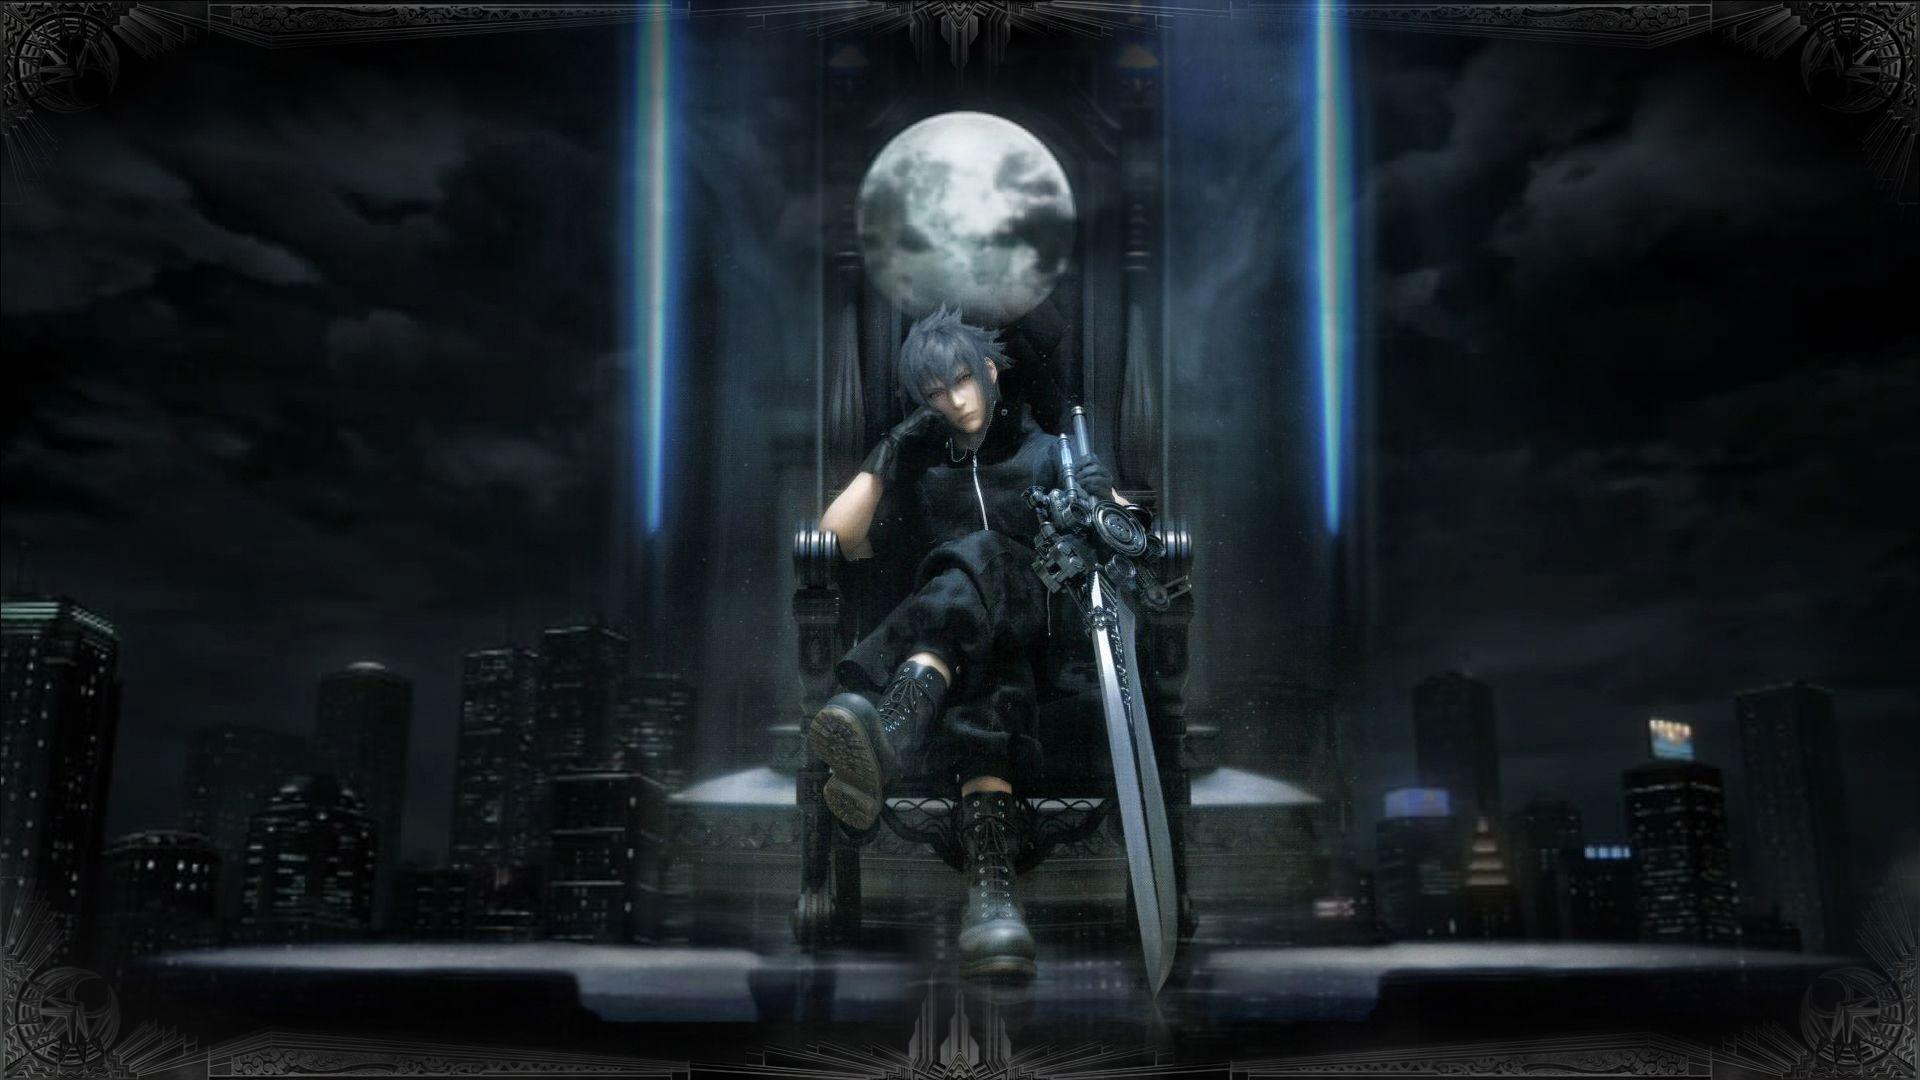 Final Fantasy Xv Wallpaper Final Fantasy 15 Noctis Throne